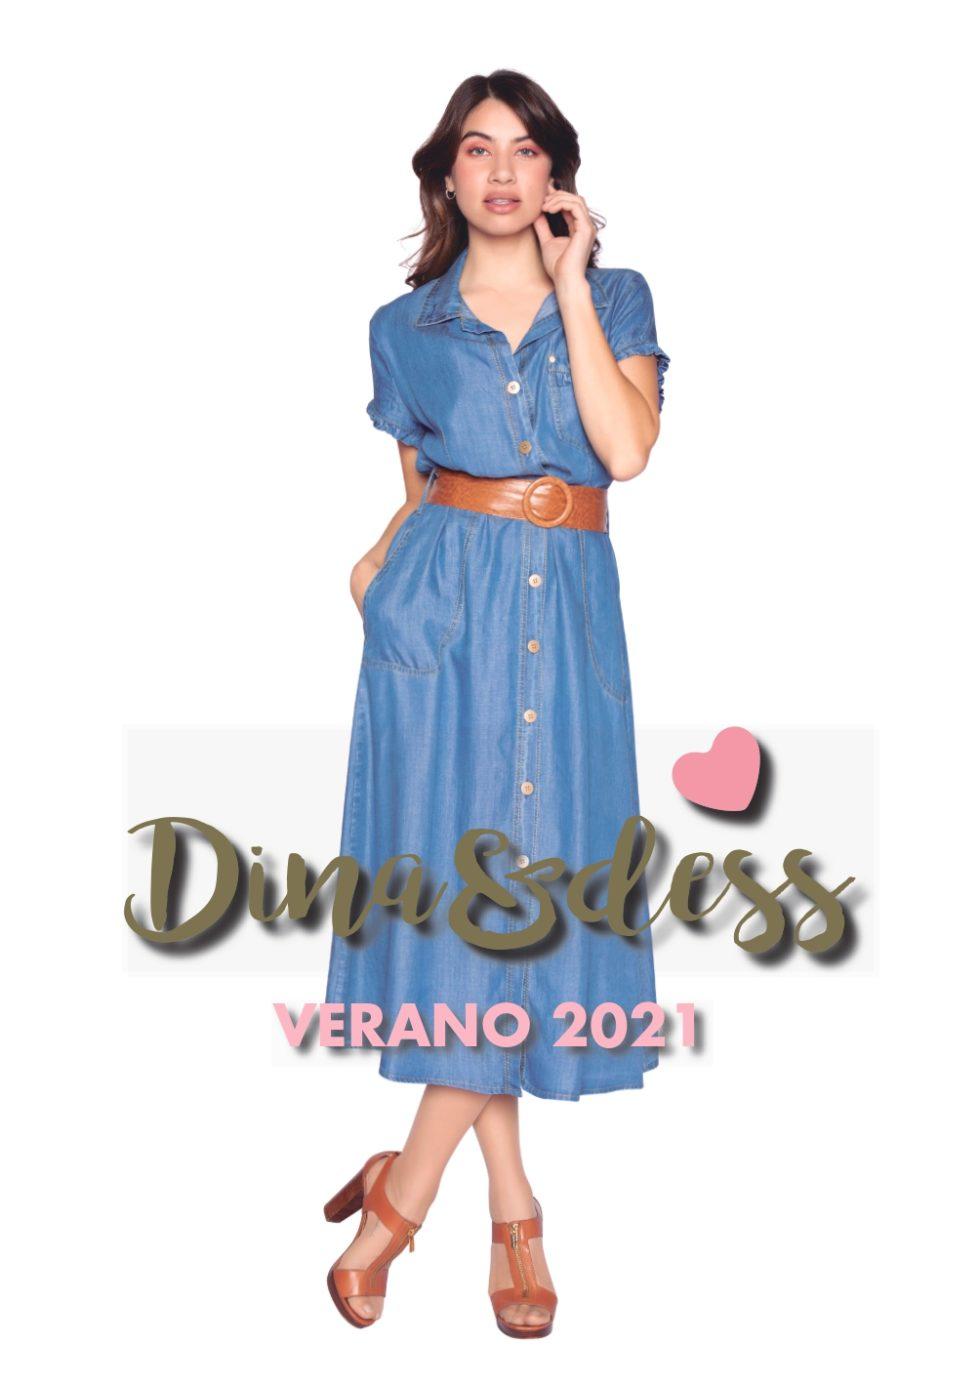 Verano 2021 Dina&Dess Clientes_page-0001